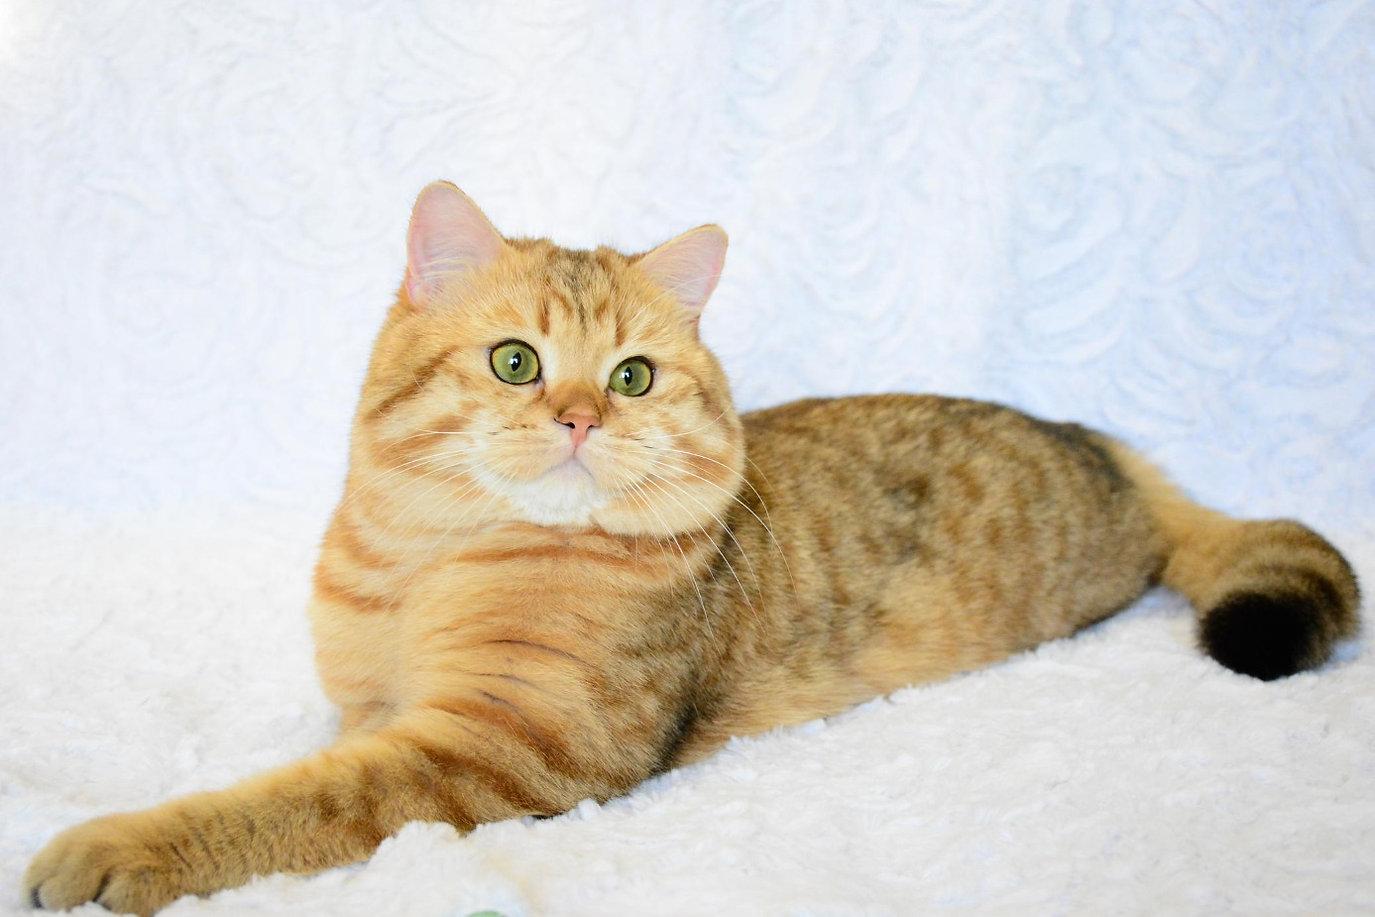 Murmuring Brook Питомник британских кошек Иркутск